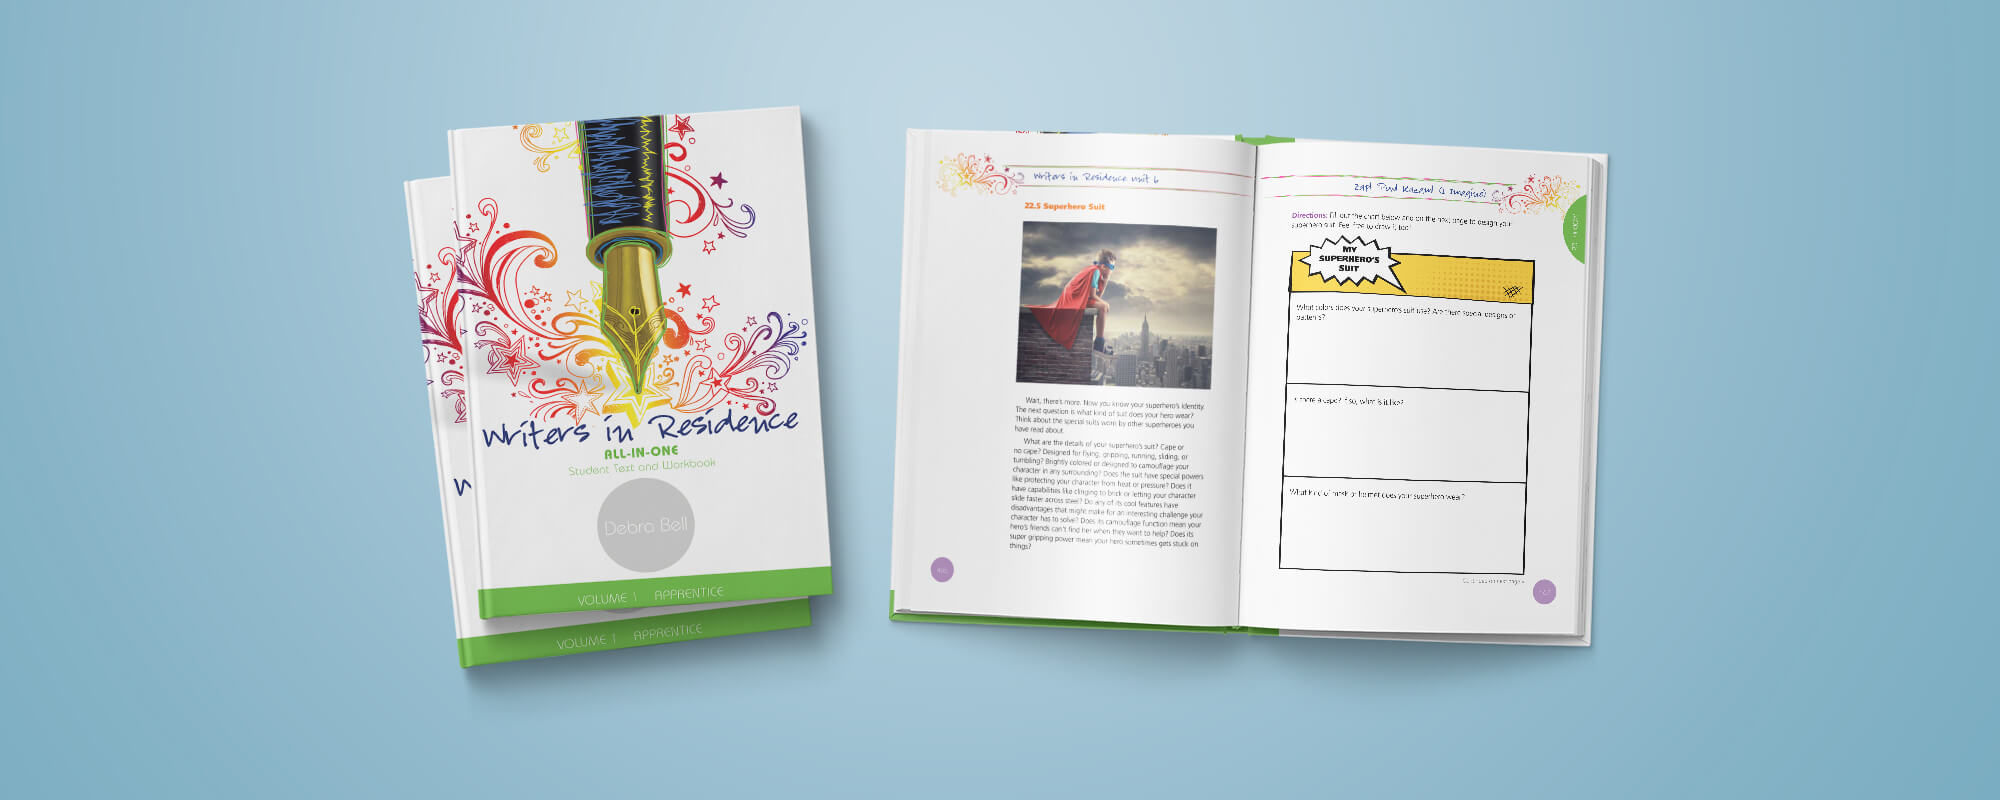 Writing Curriculum Workbook Design